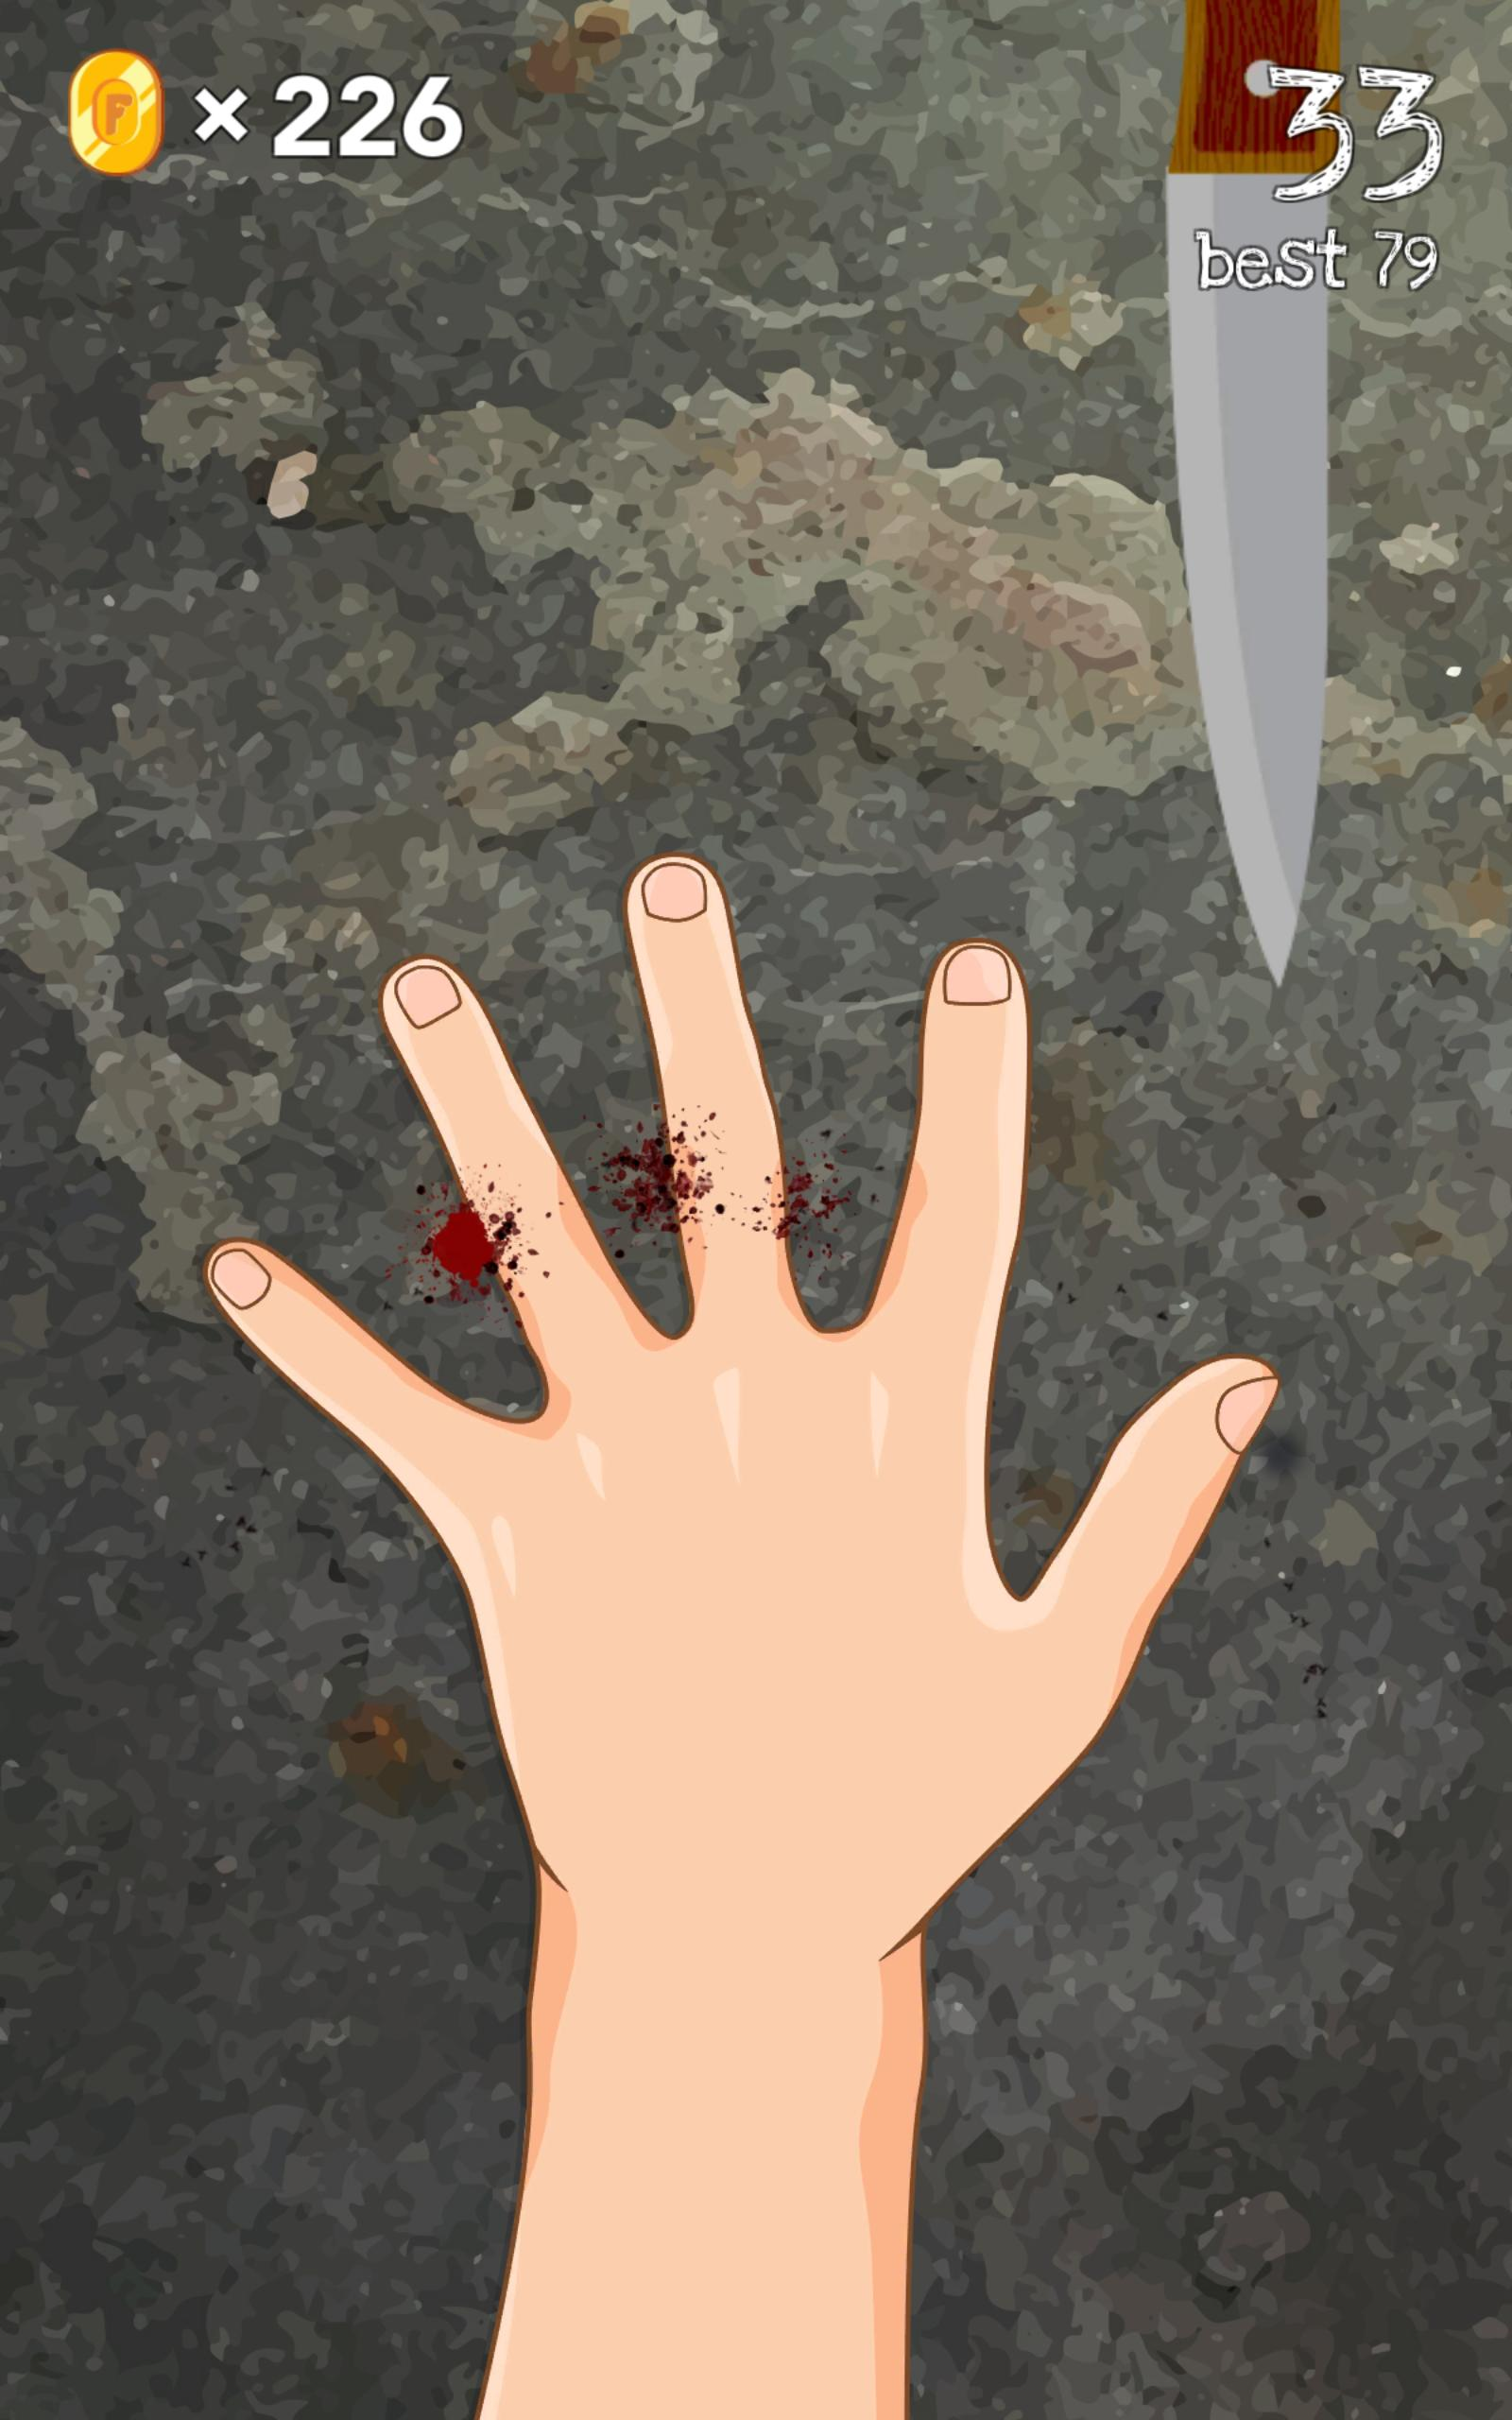 4 Fingers - free knife games 3.4 Screenshot 5